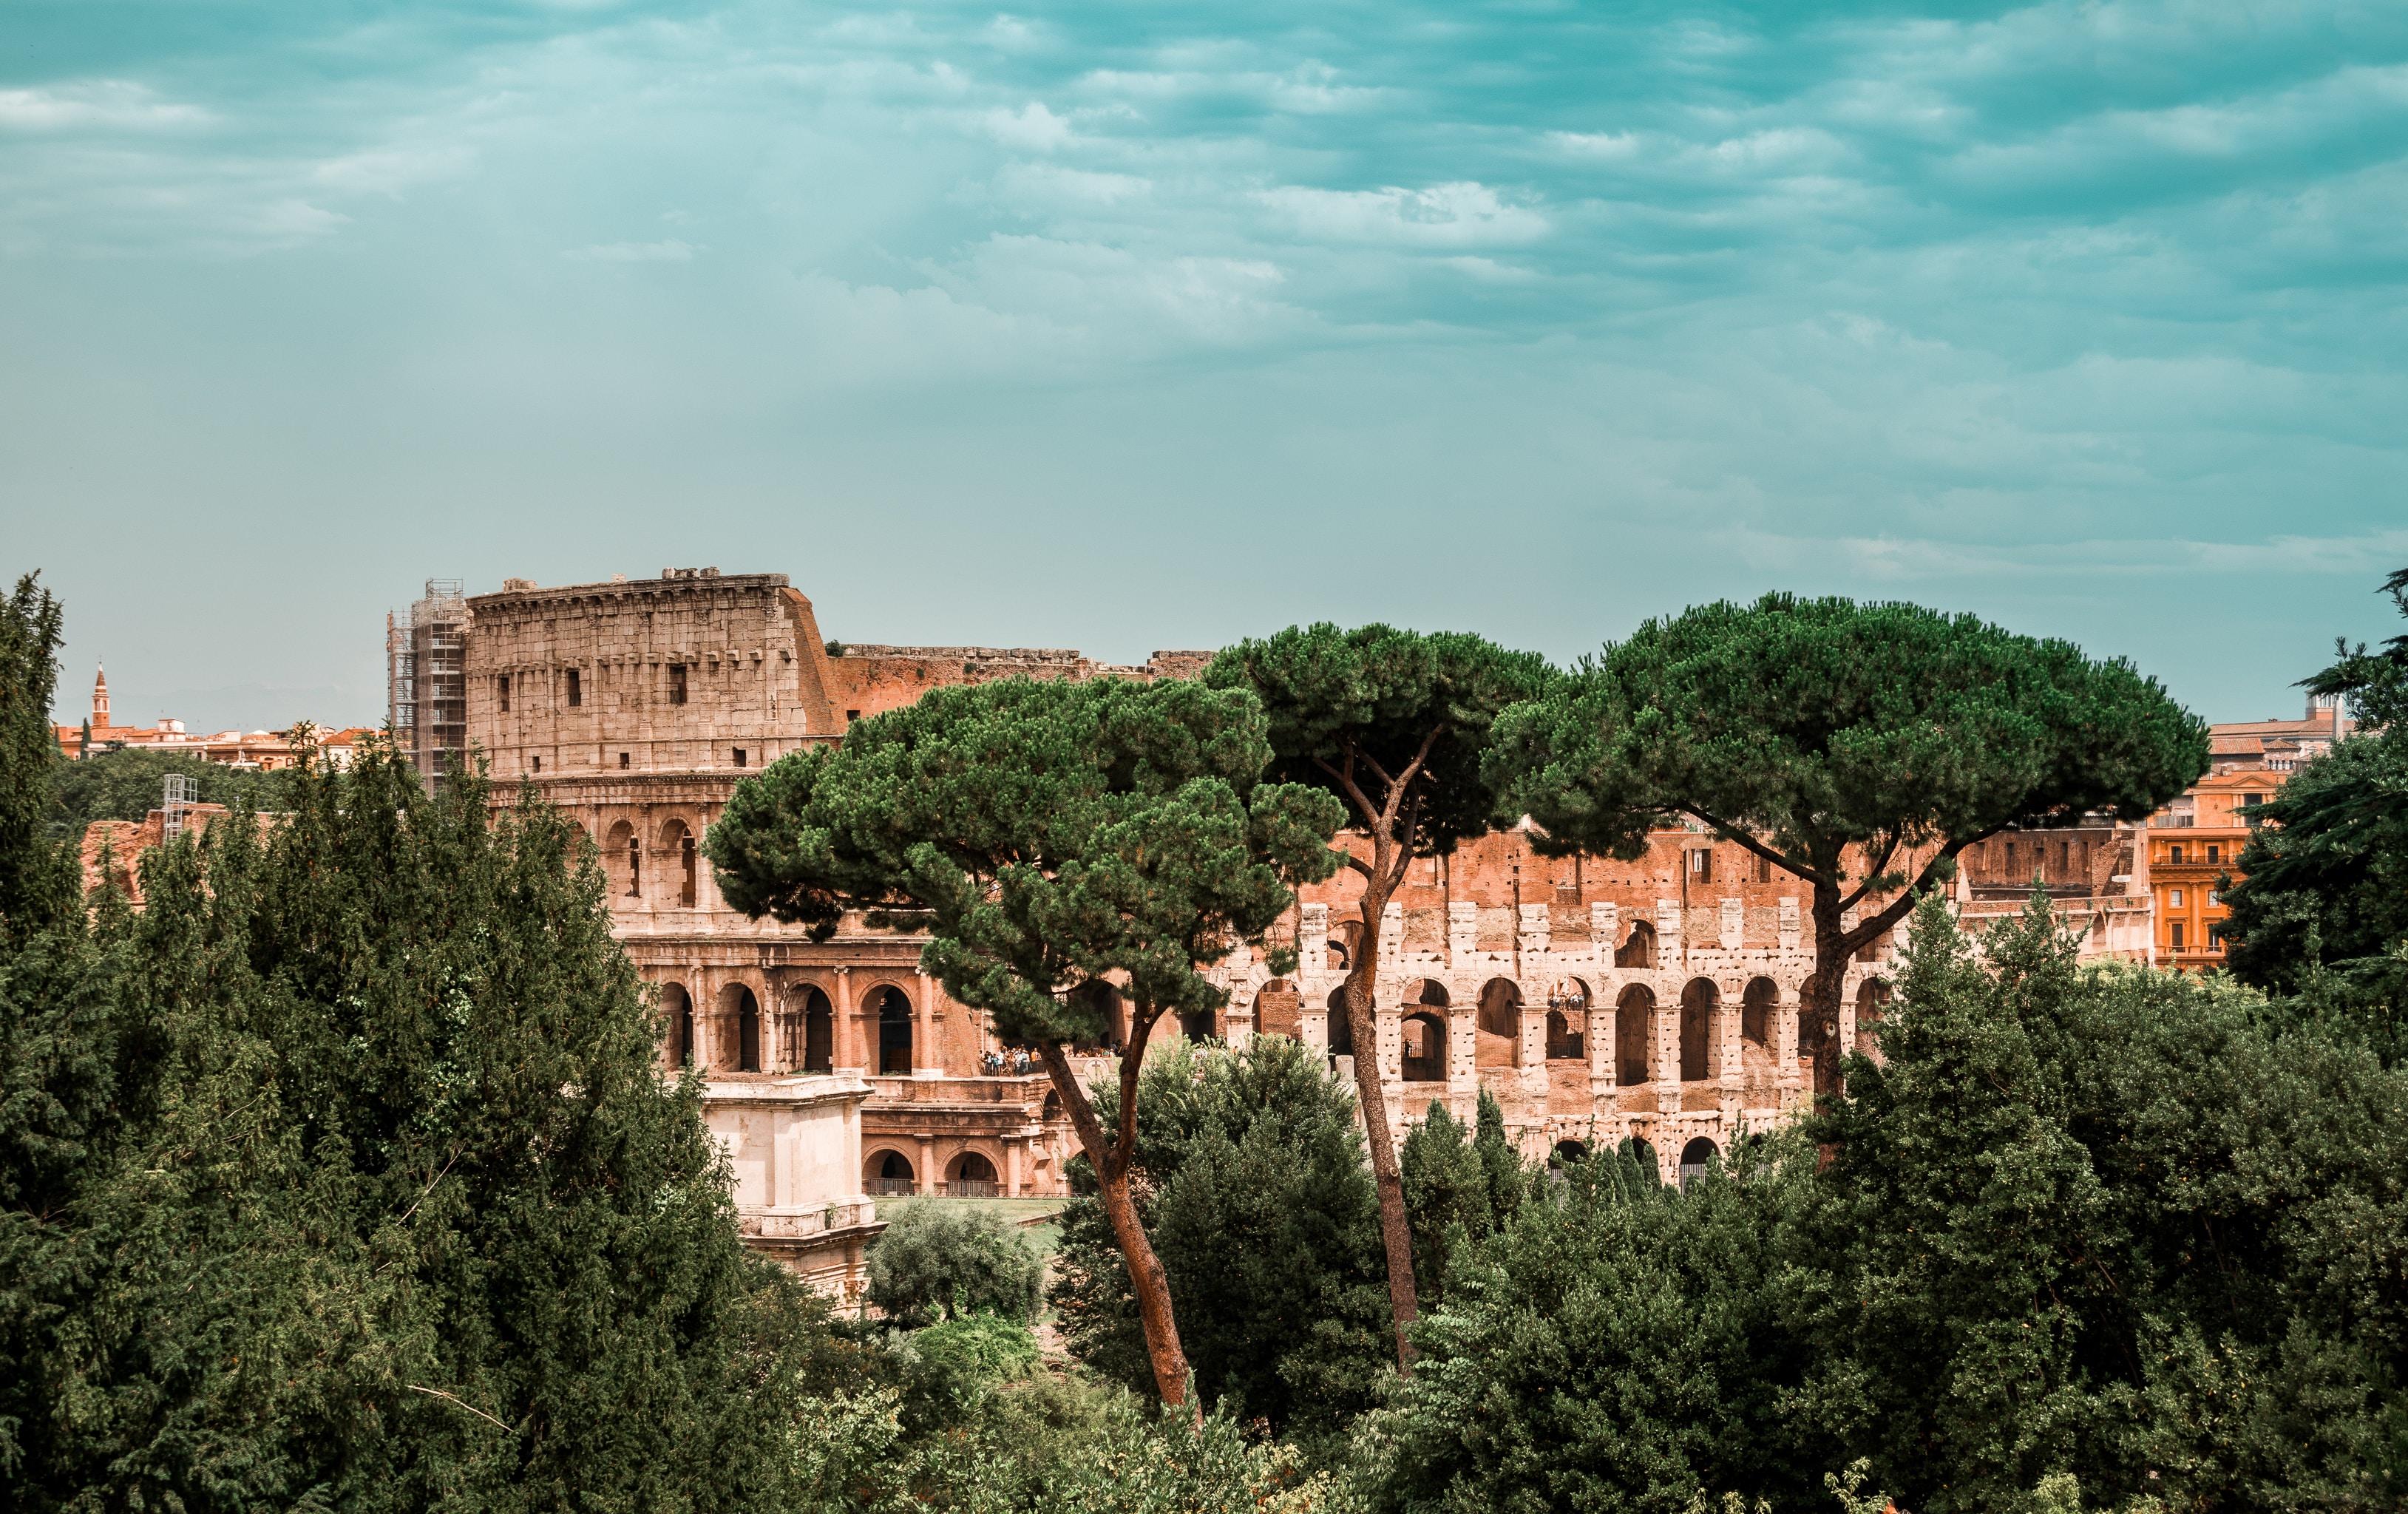 Coliseum in Italy